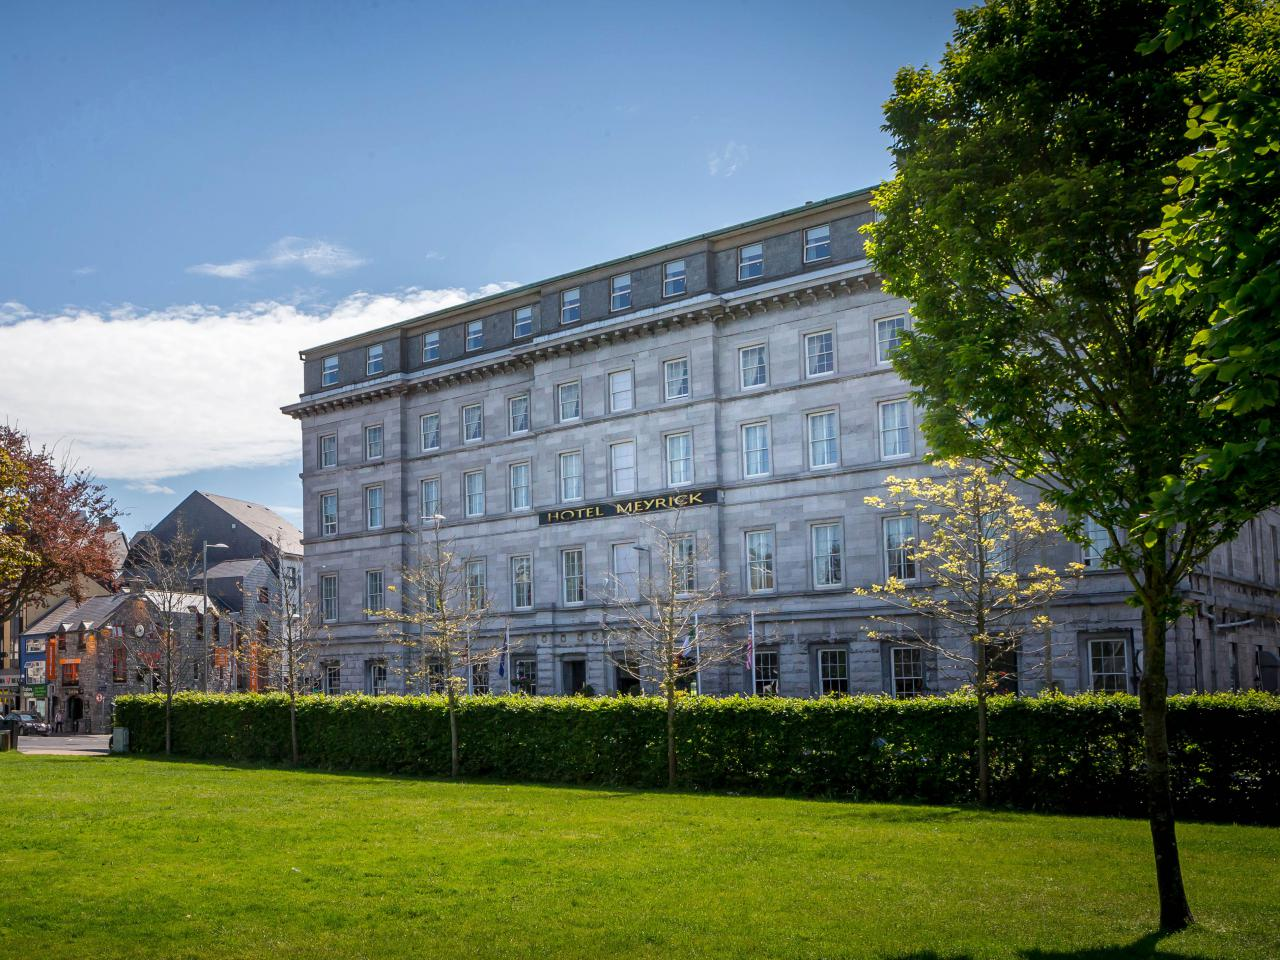 The Meyrick Hotel Galway | Personal Chauffeur Ireland